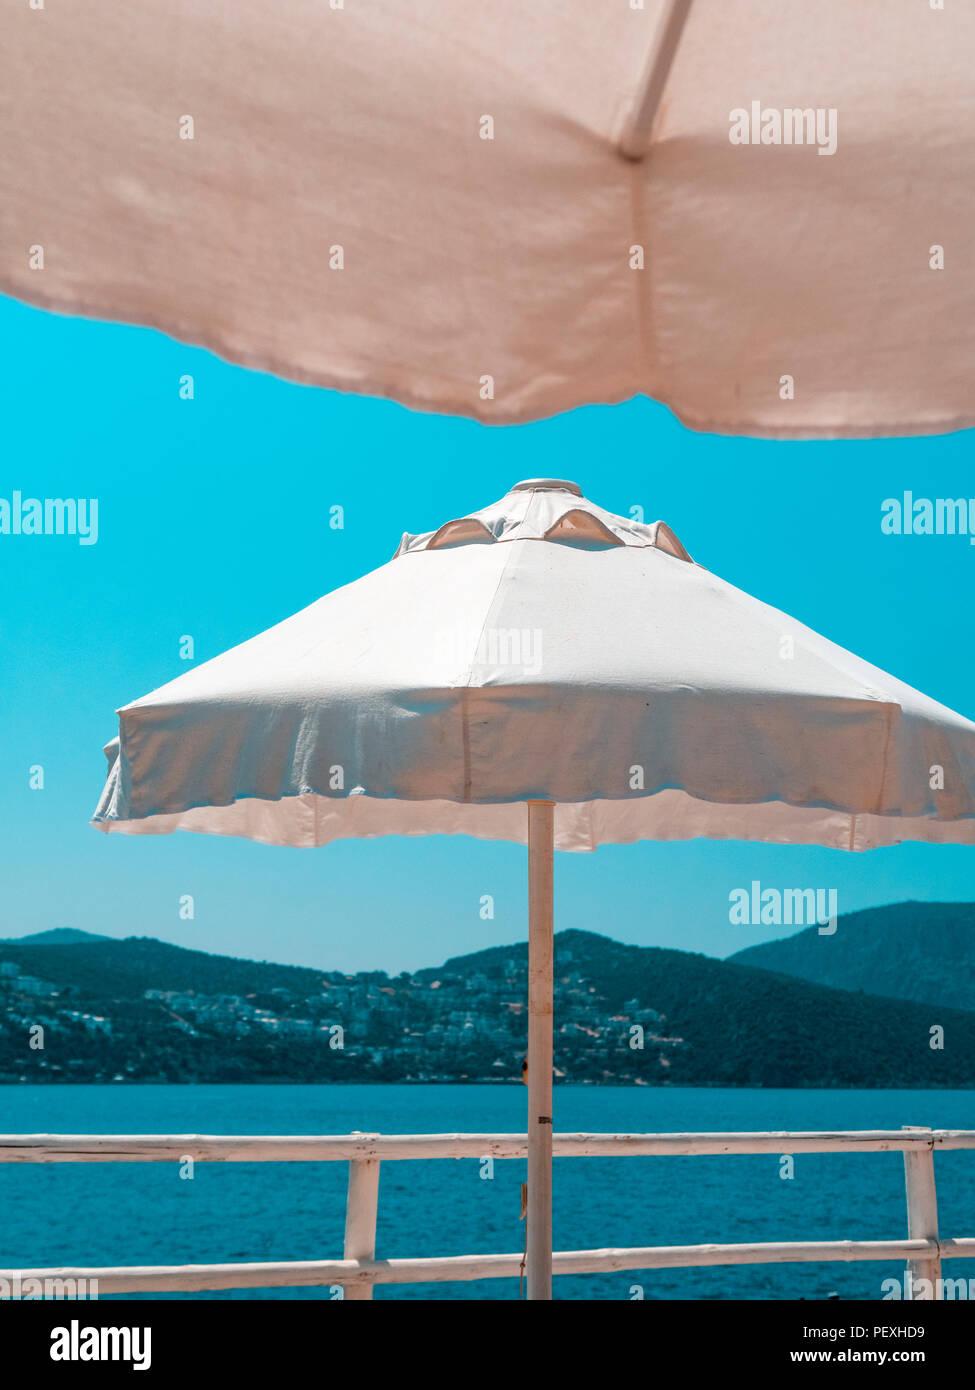 Sonnenschirme gegen den blauen Himmel Stockbild